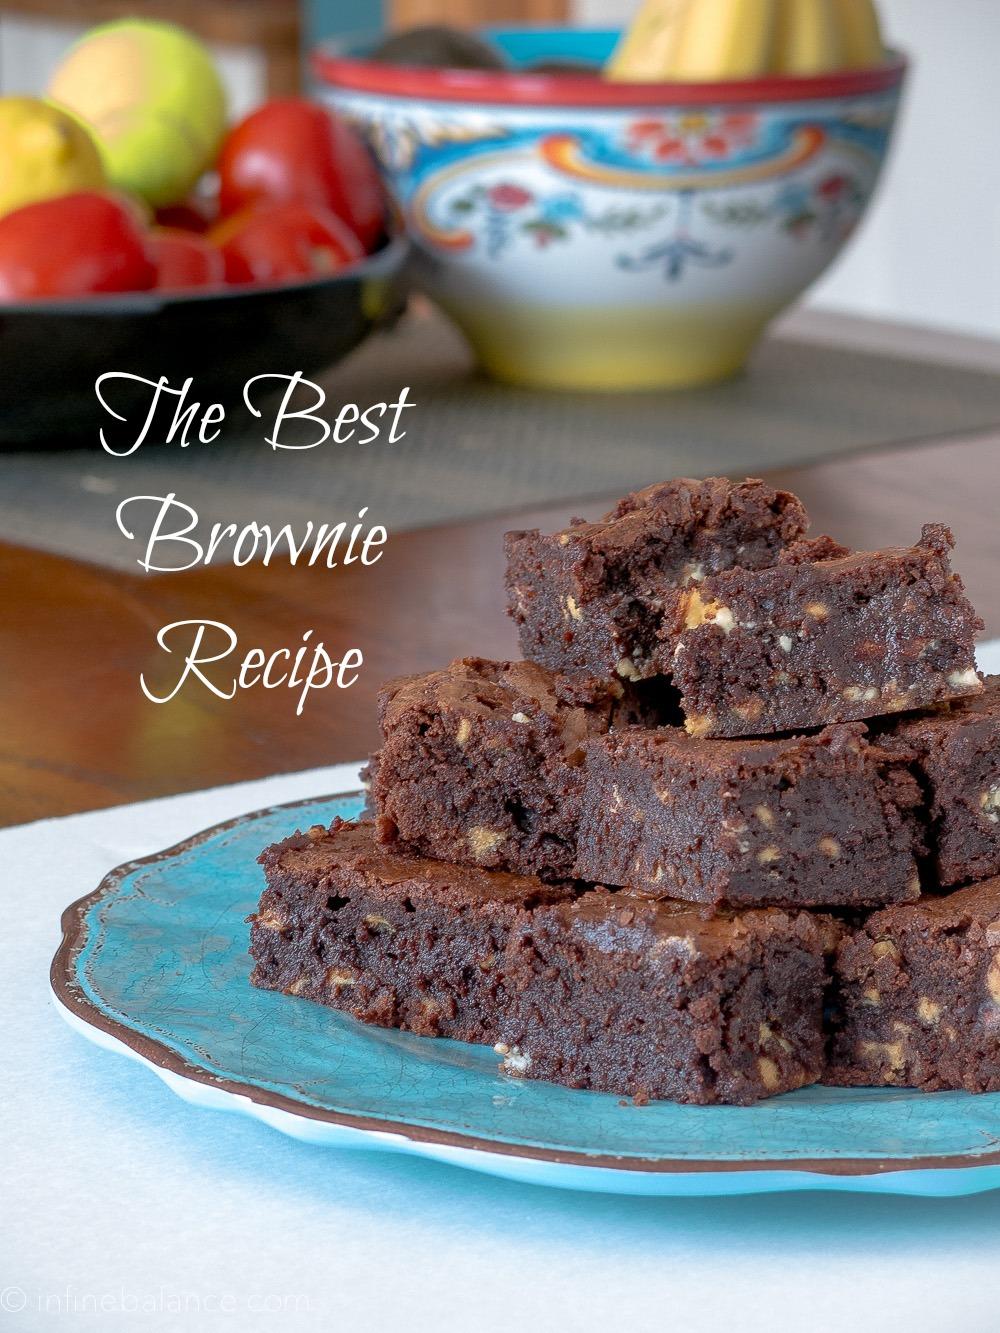 Best Brownie Recipe | infinebalance.com #recipe #chocolate